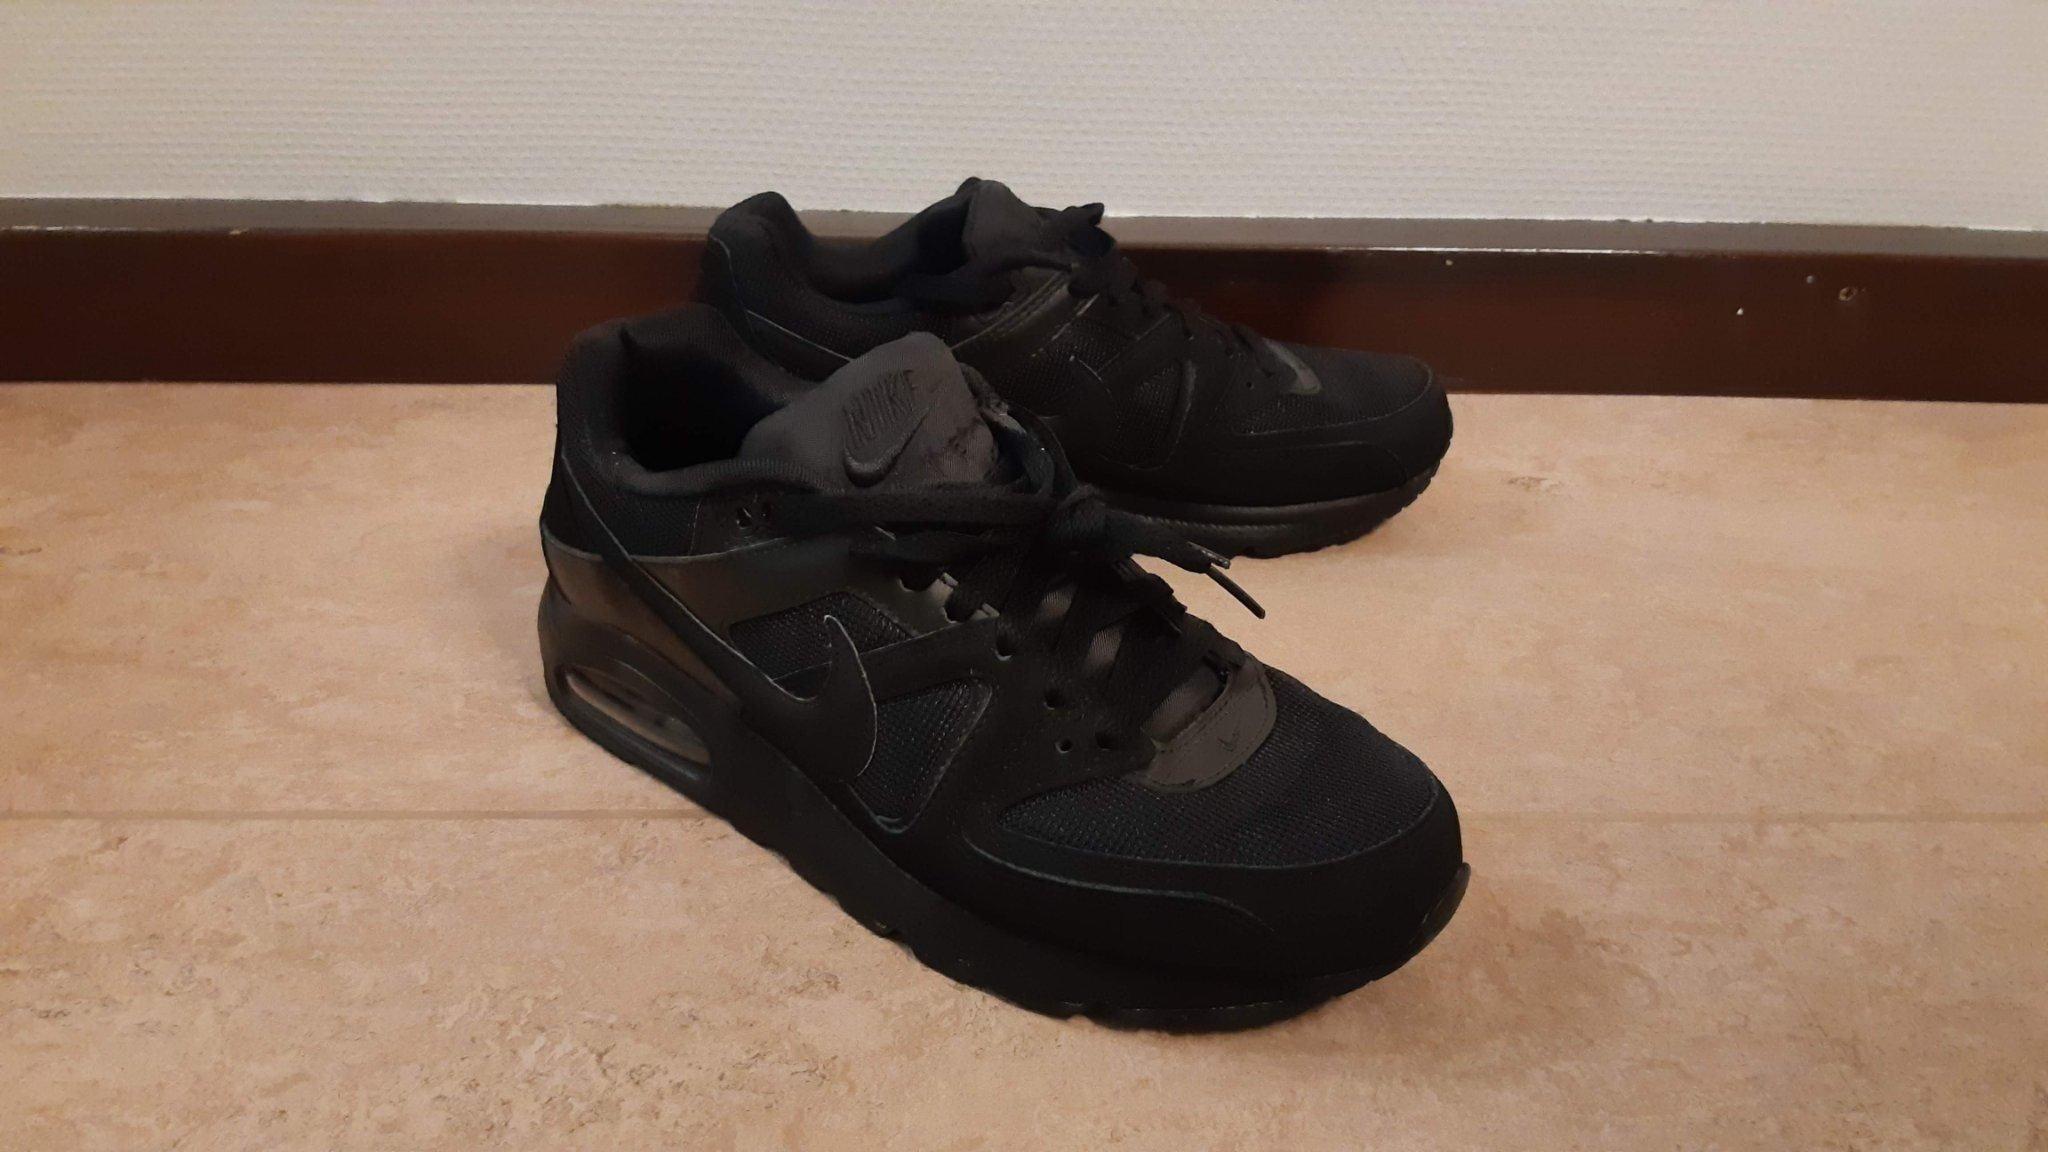 Nike Air Max Command Black Edition (Strl 42.5) .. (344267107